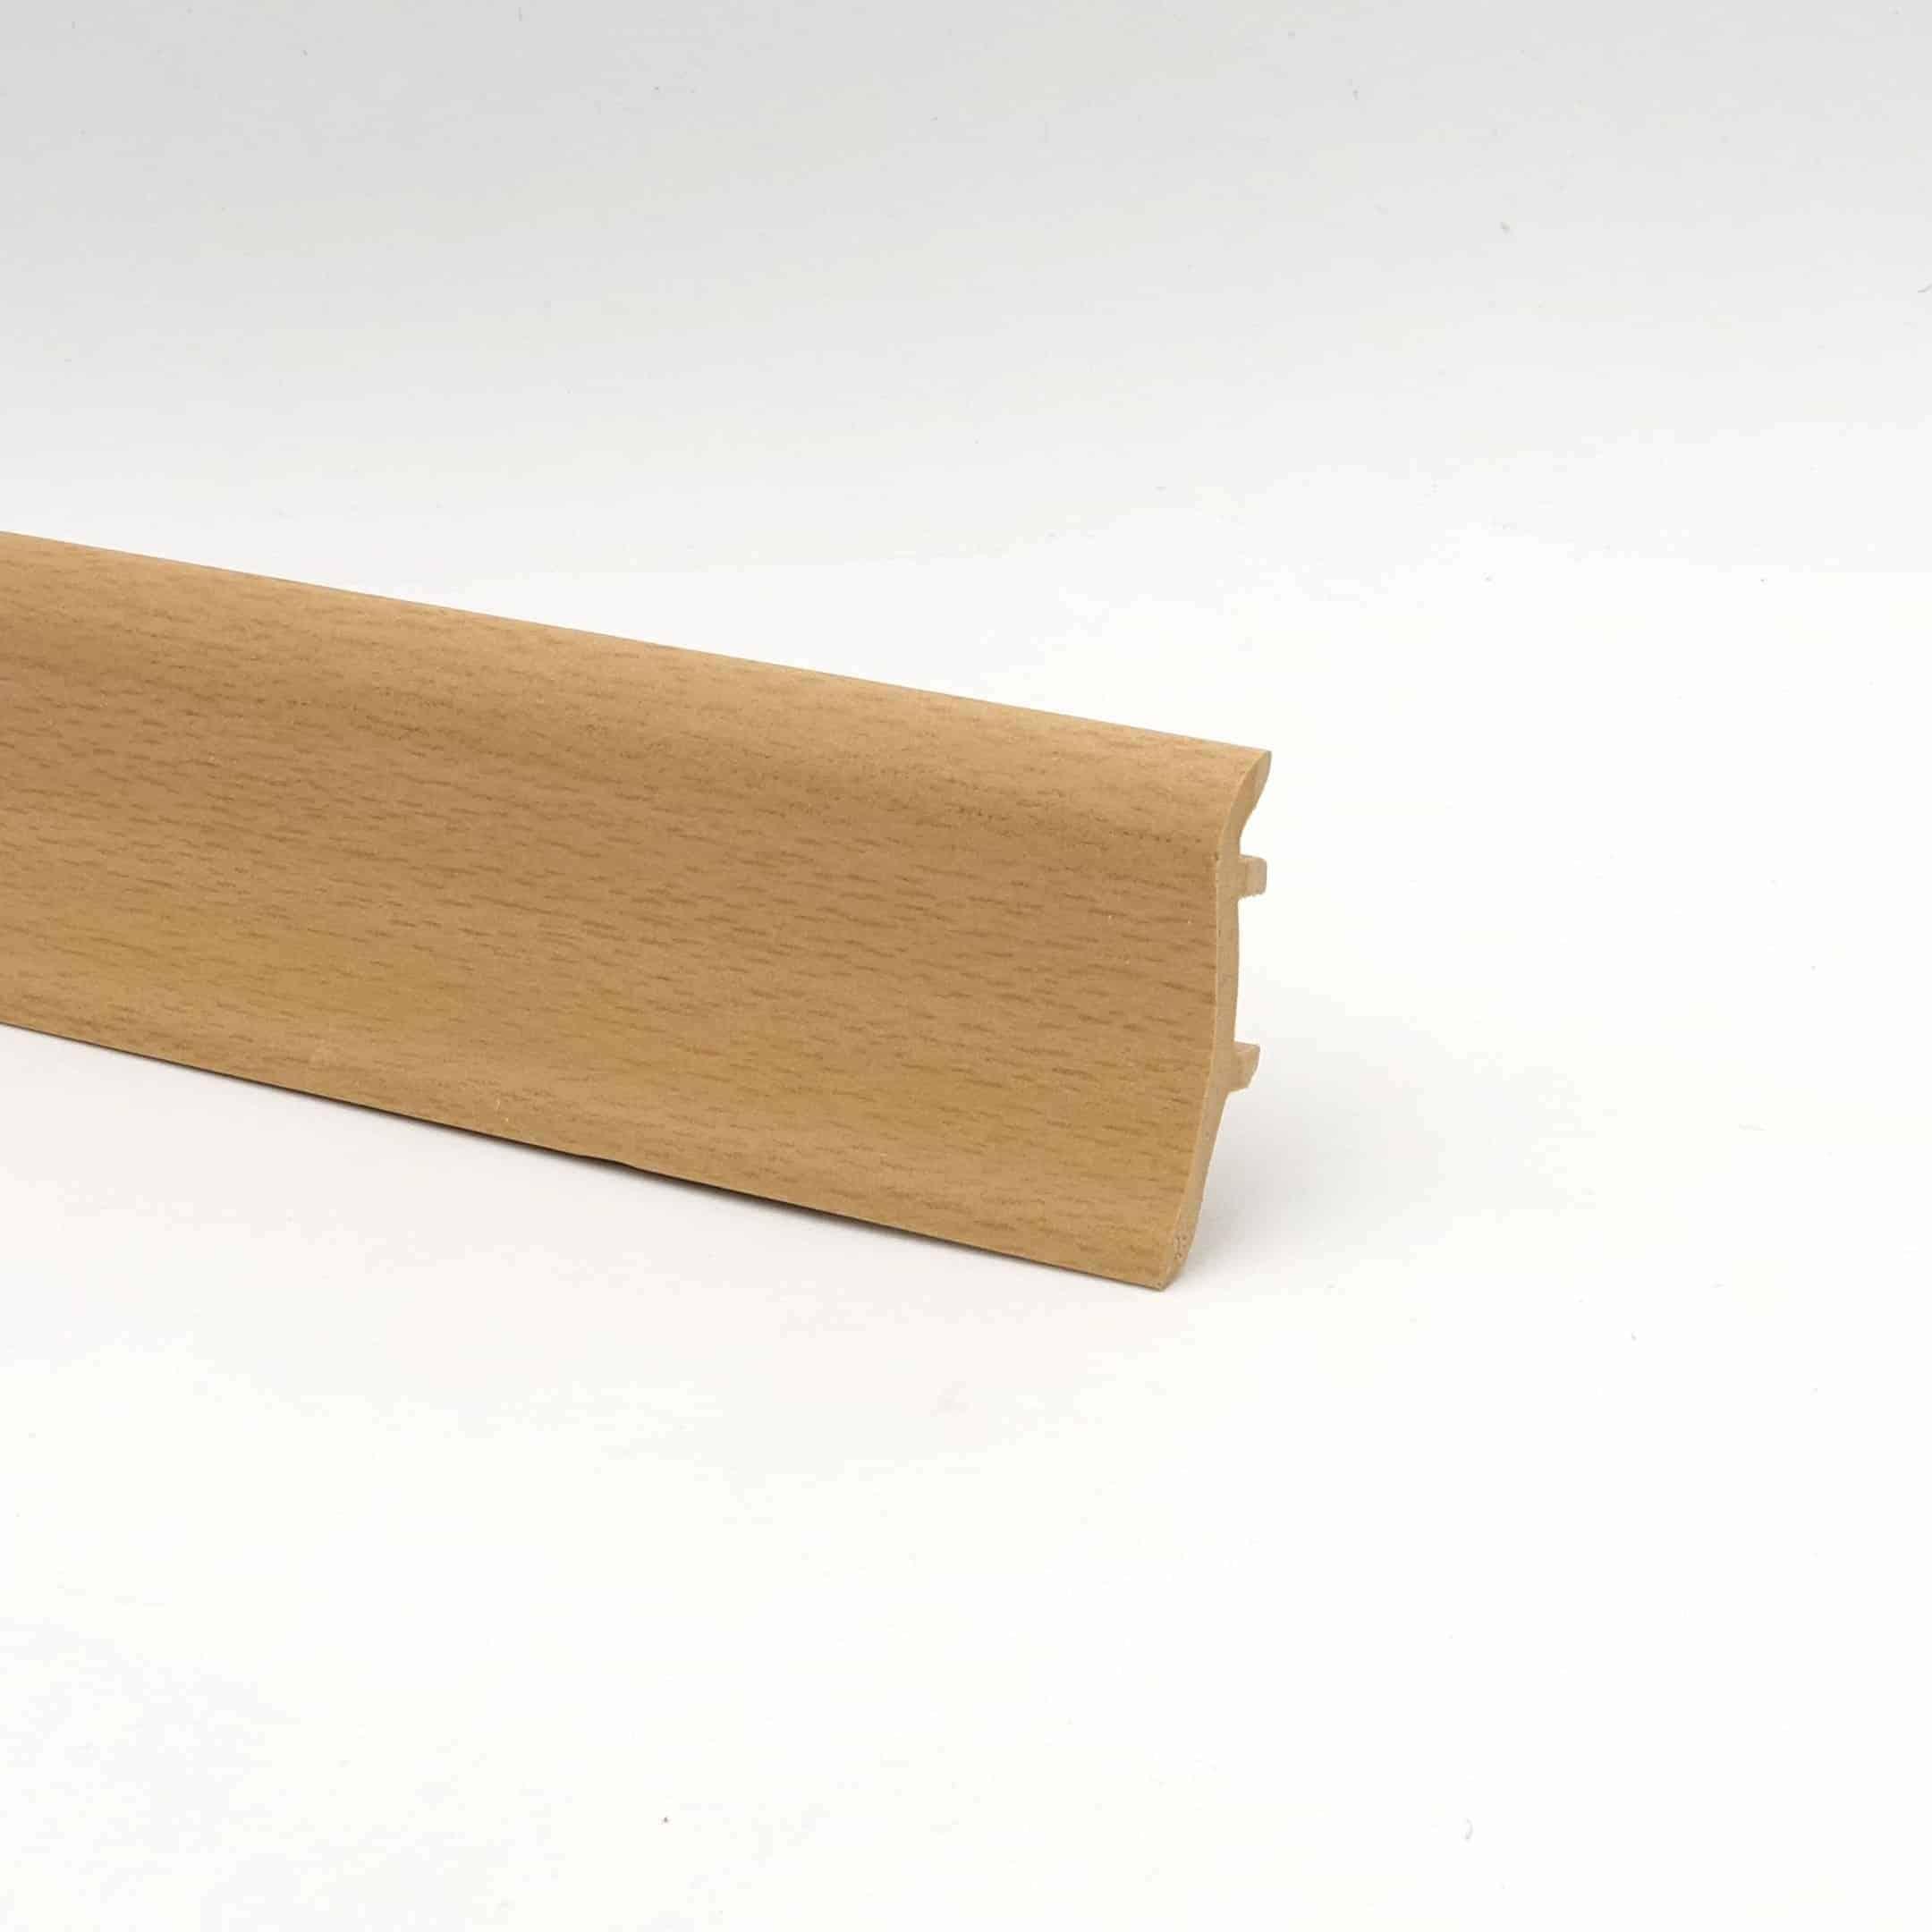 Sockelleiste - Hartschaumleiste in 2,5m Länge